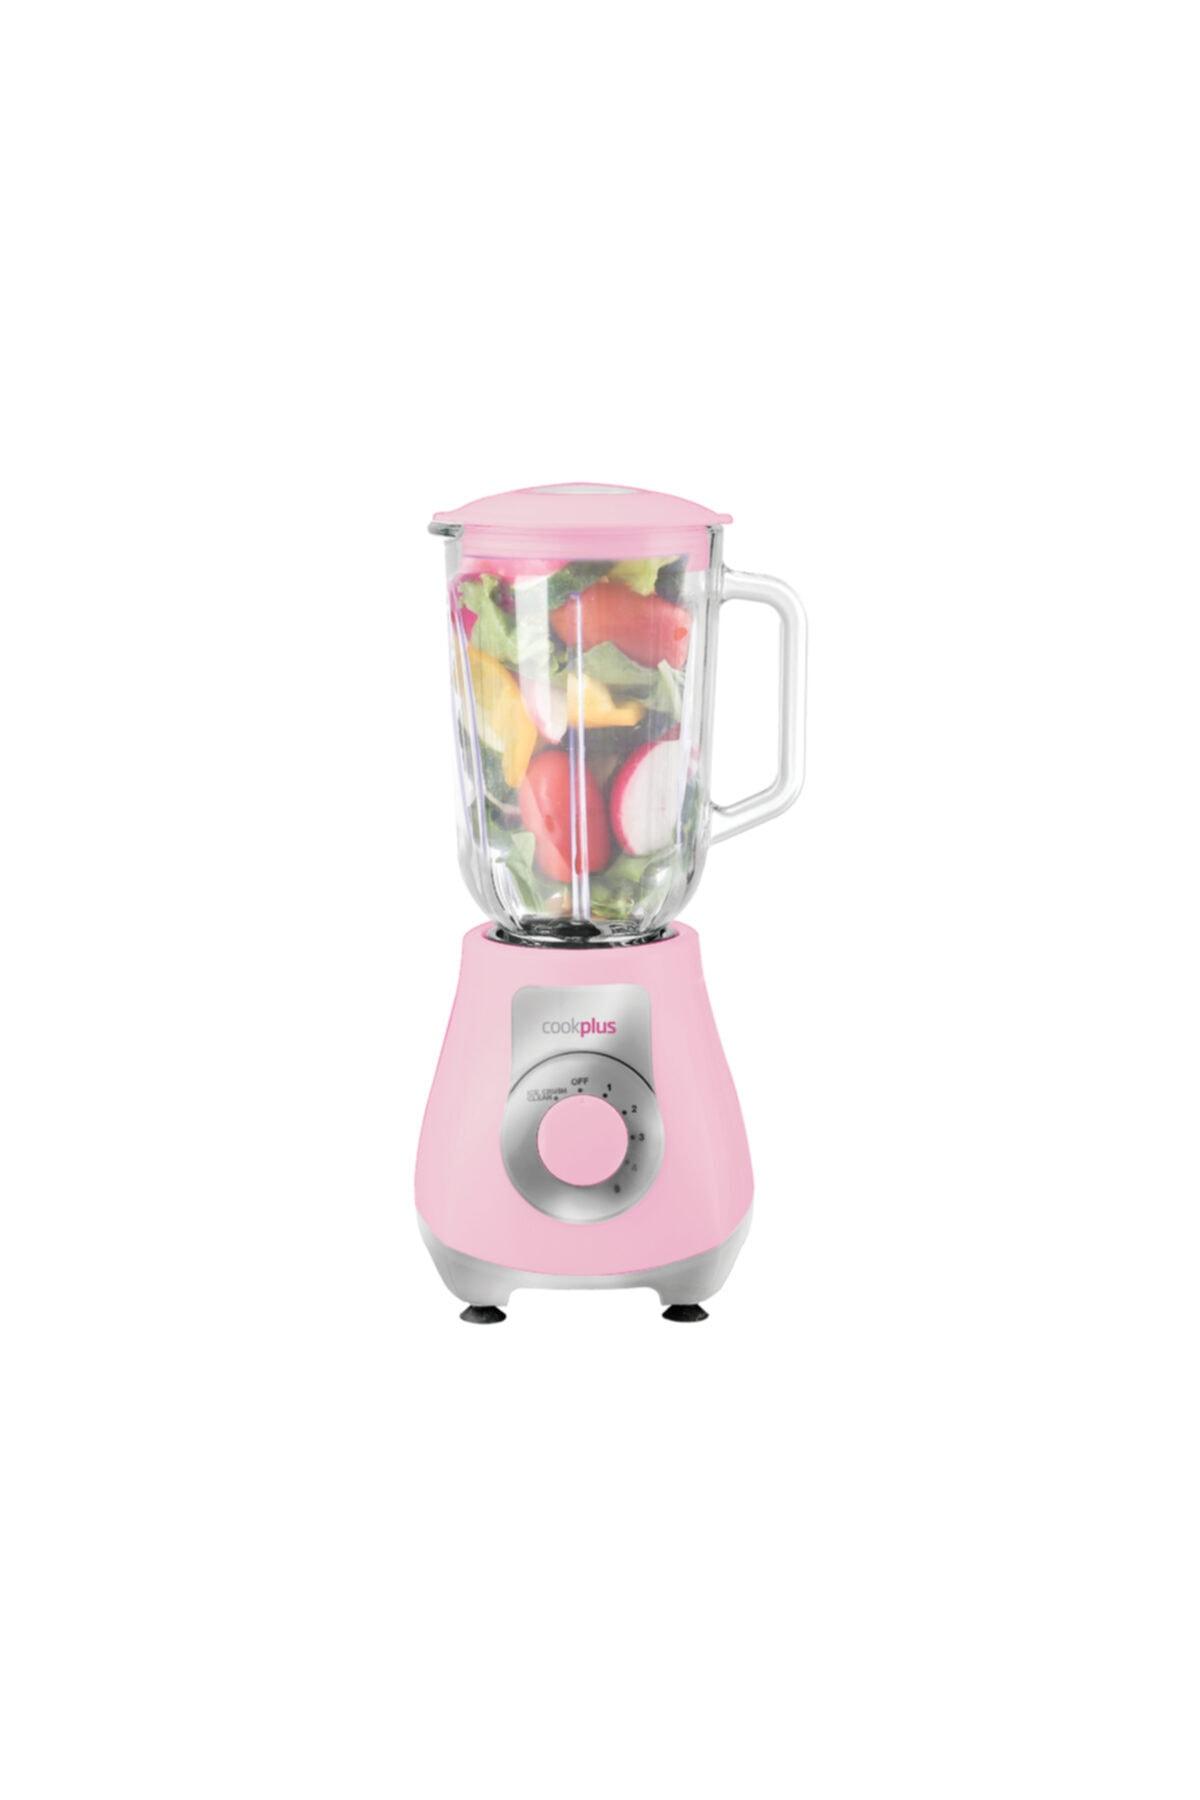 Cookplus Smoothie Shaker Pink Blender 751 1